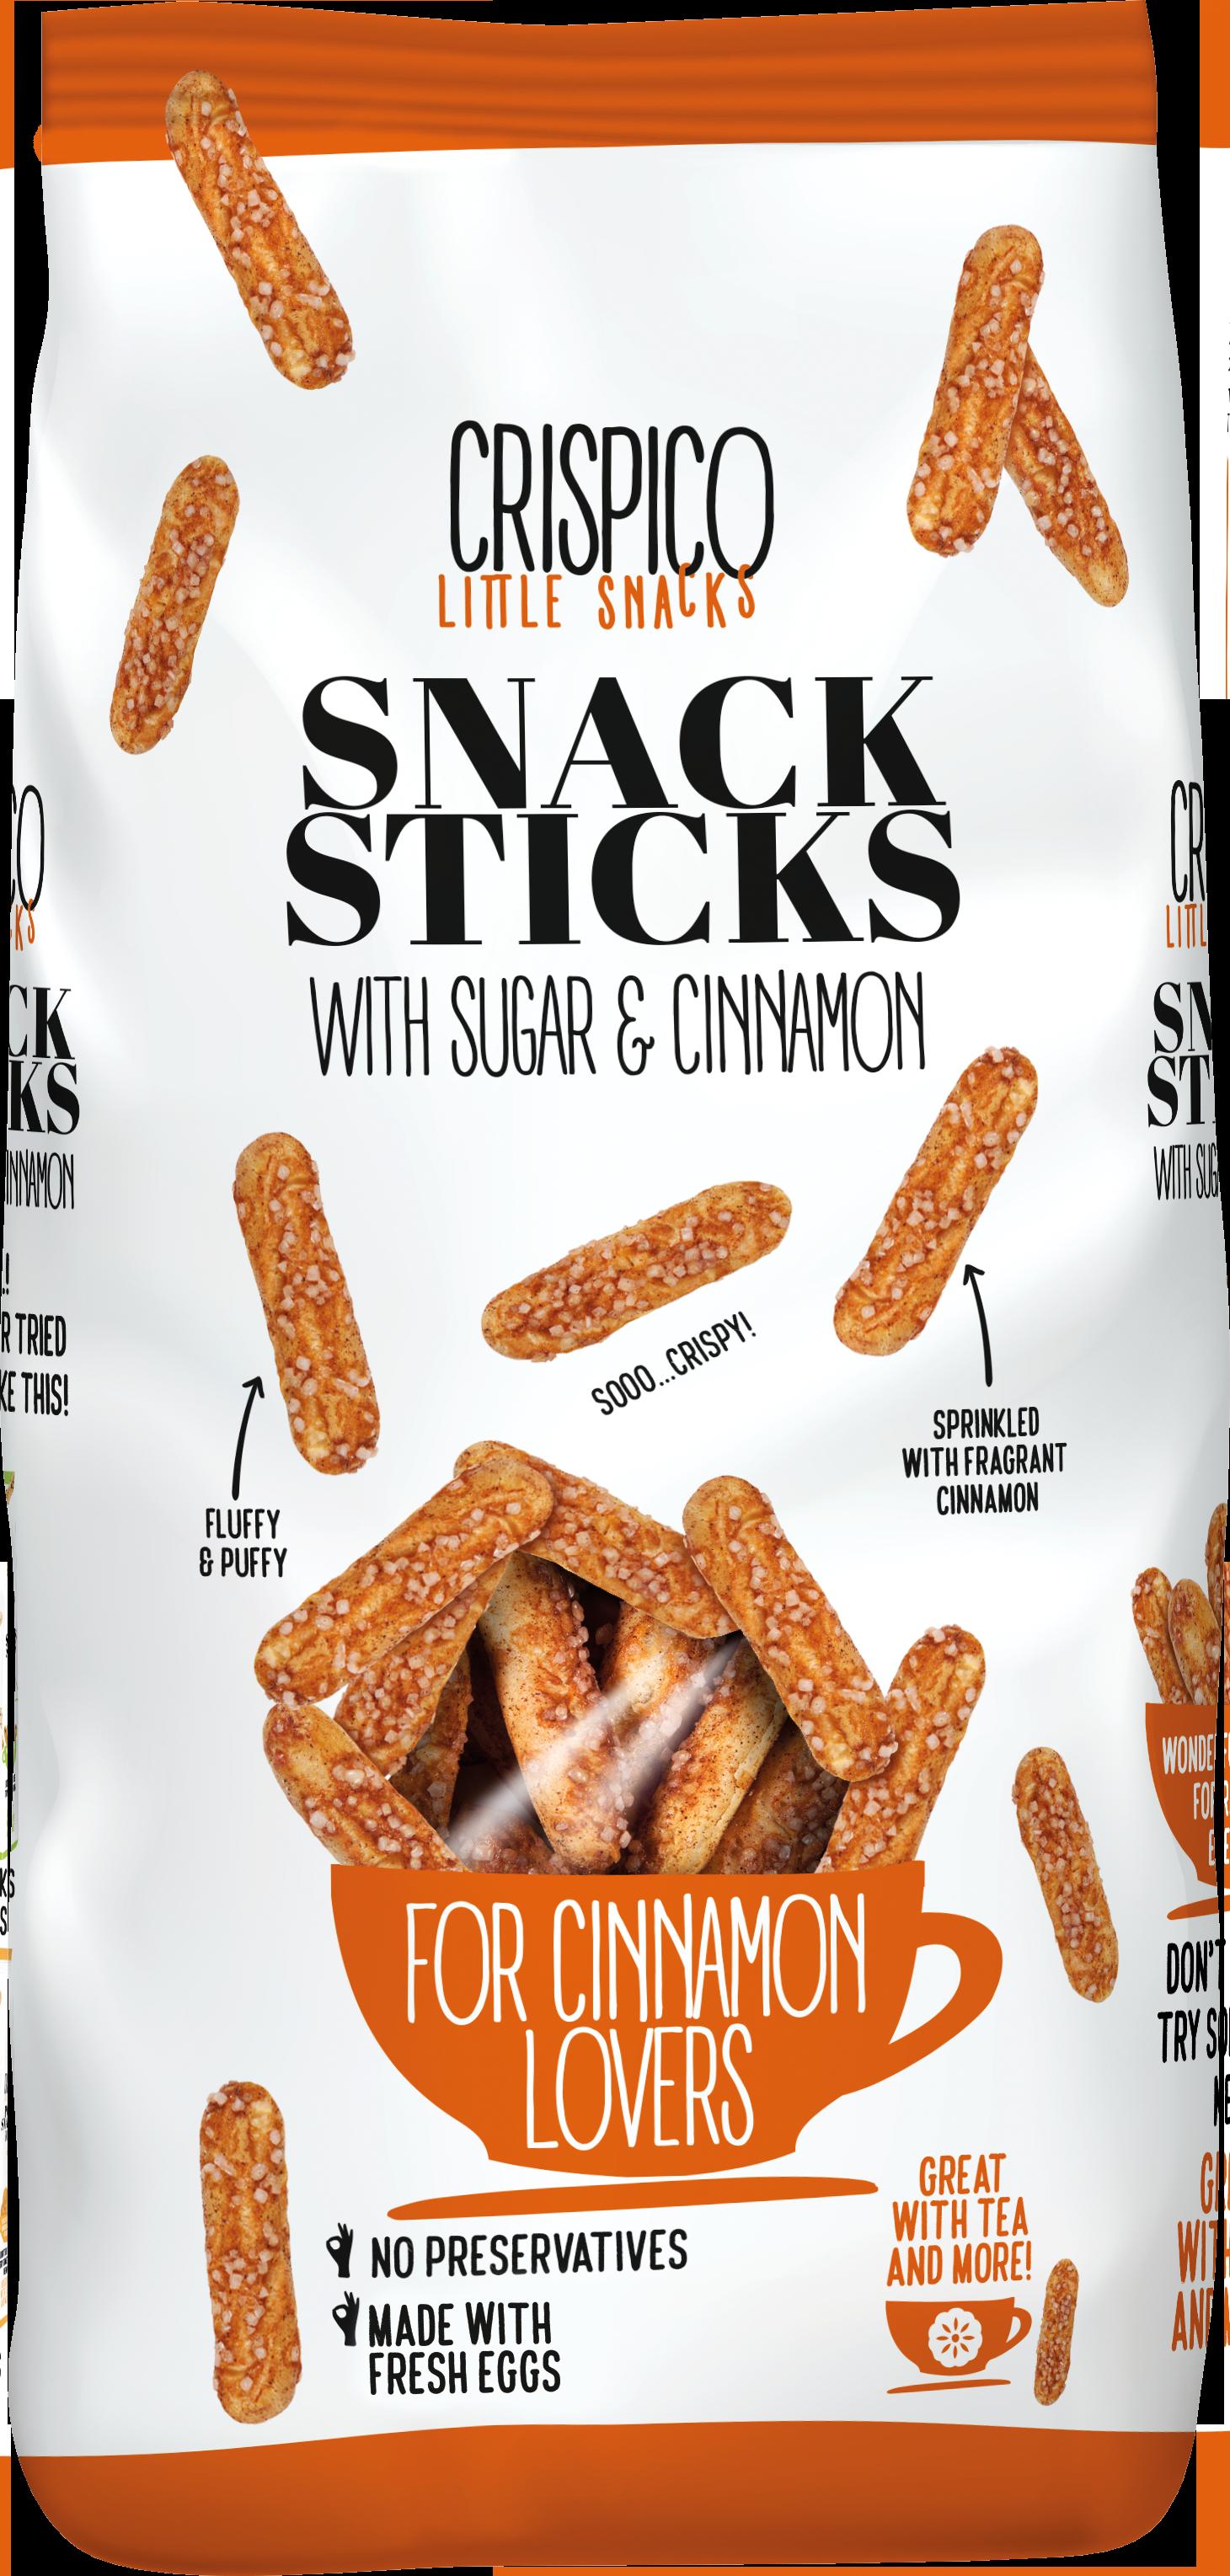 Crispico snack sticks with cinnamon